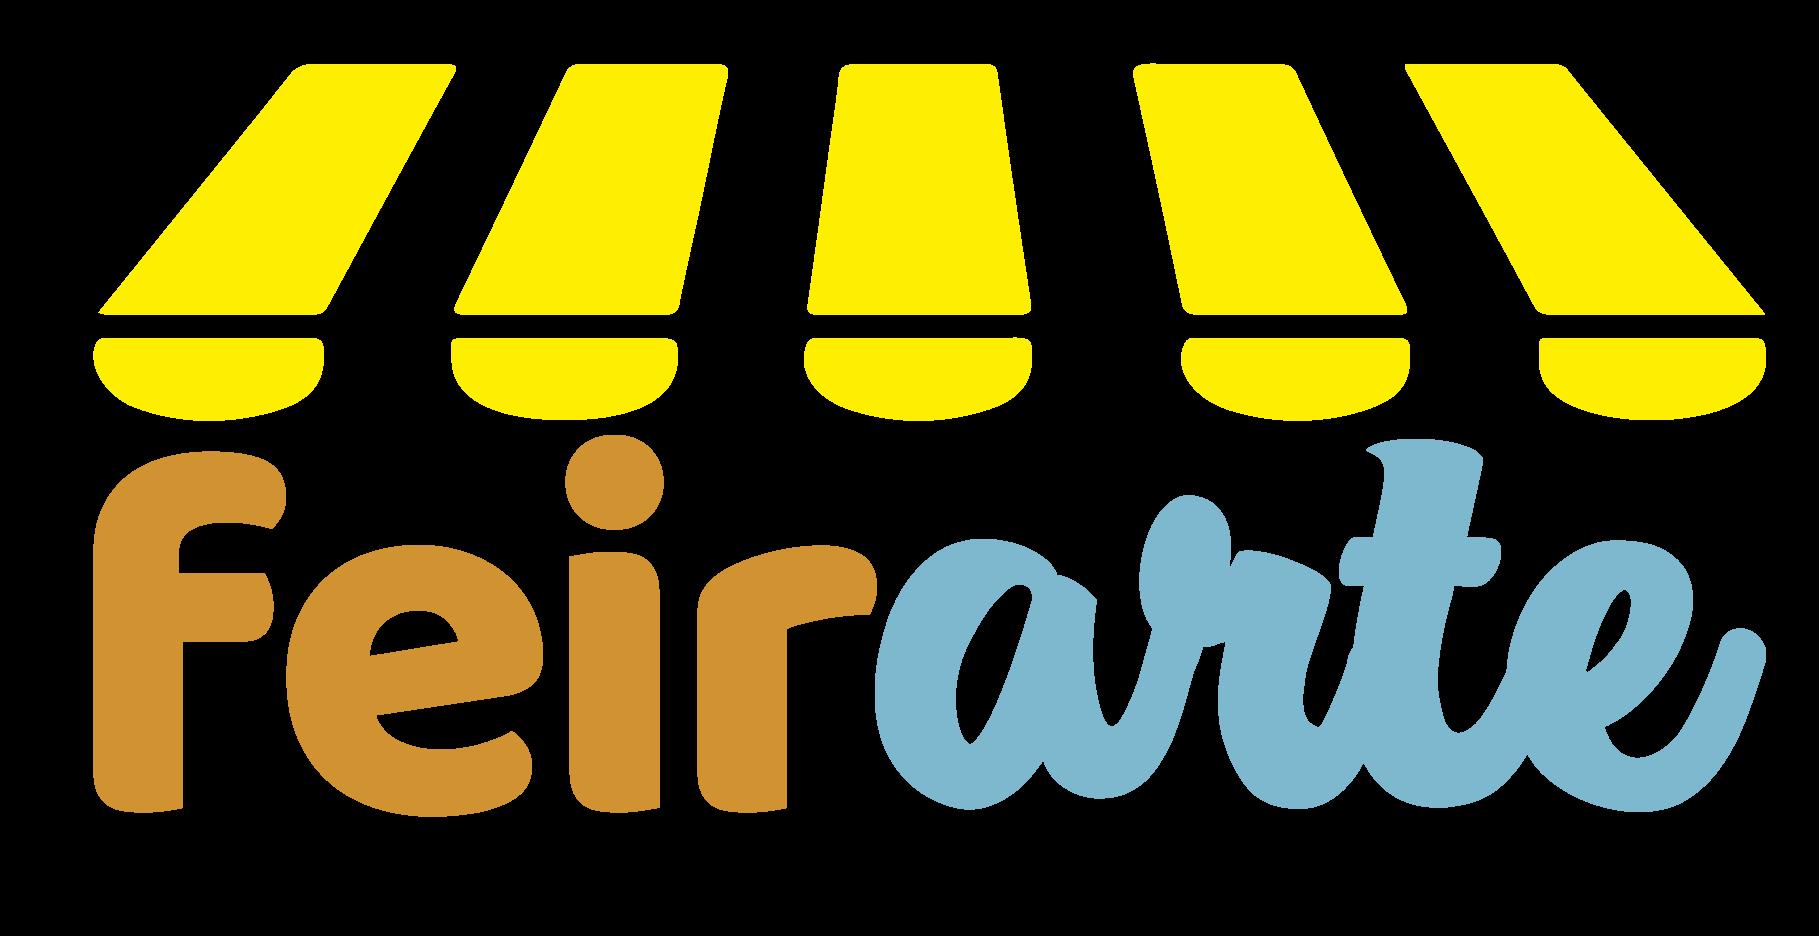 Feirarte - 1ª Feira de Artes Manuais de Maricá